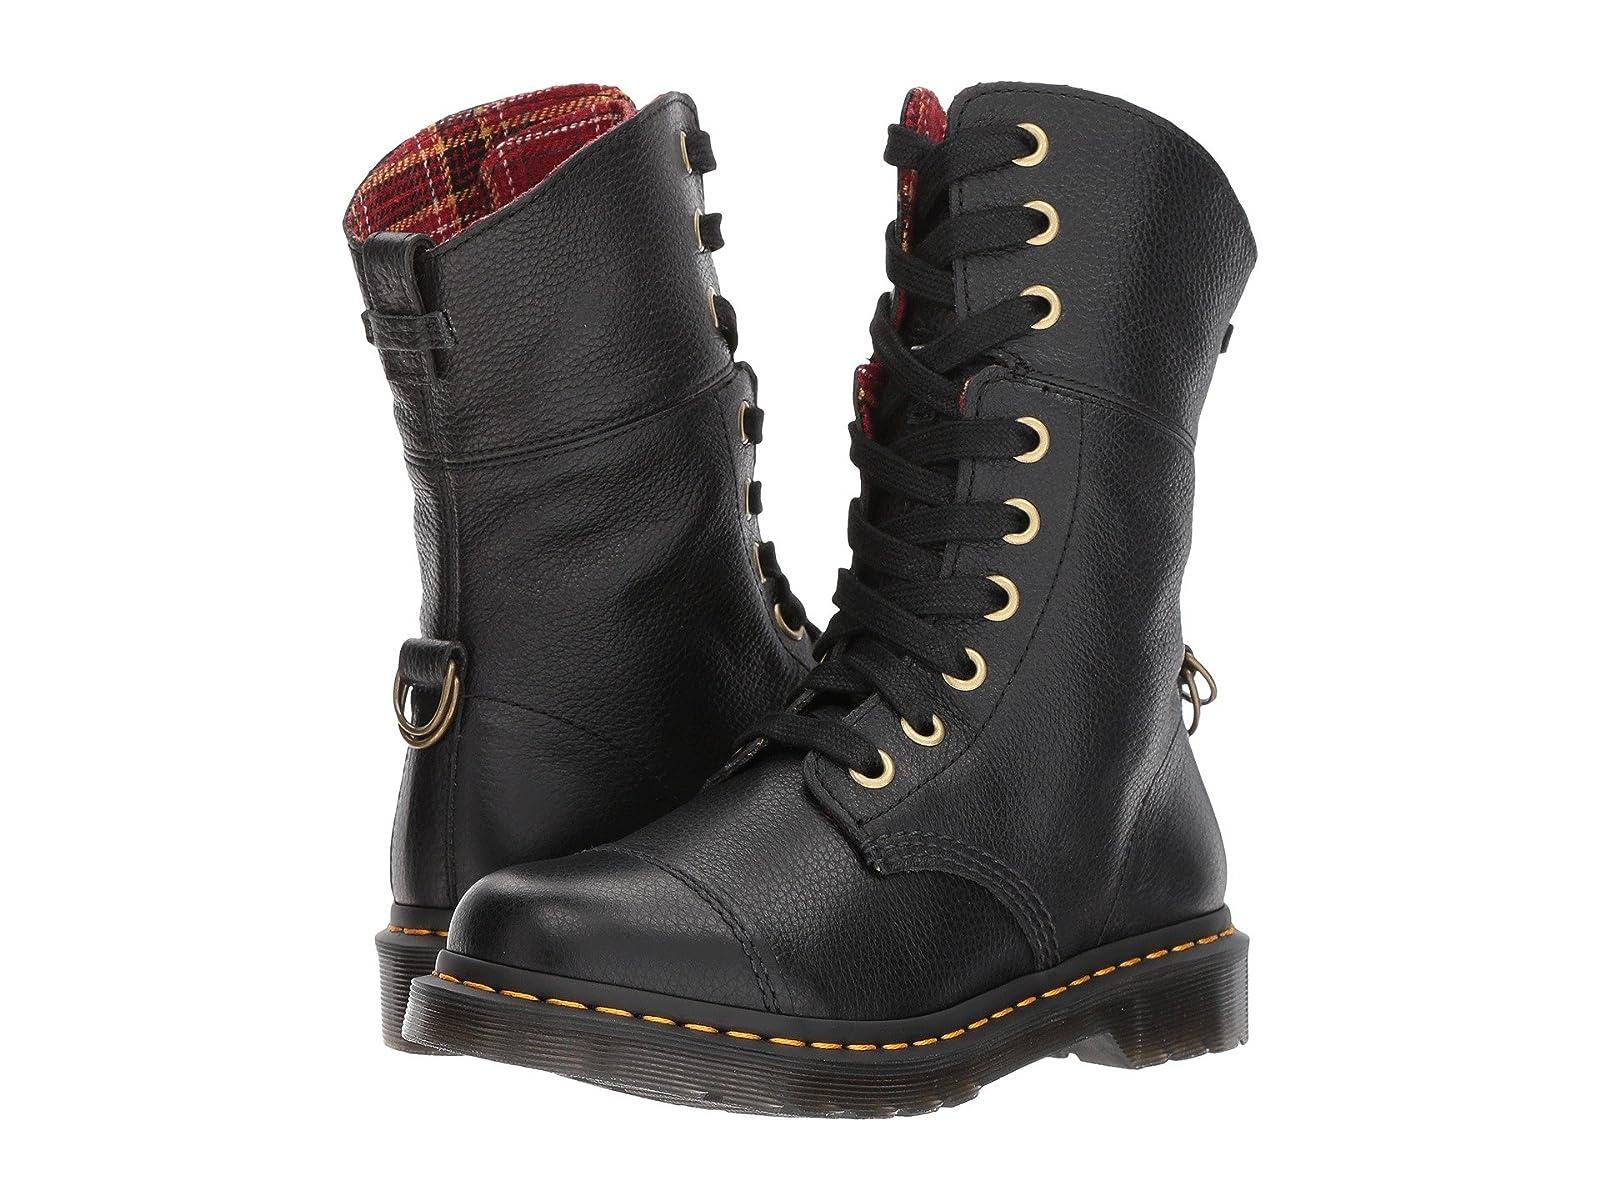 Dr. Martens Aimilita 9-Eye Toe Cap BootAffordable and distinctive shoes